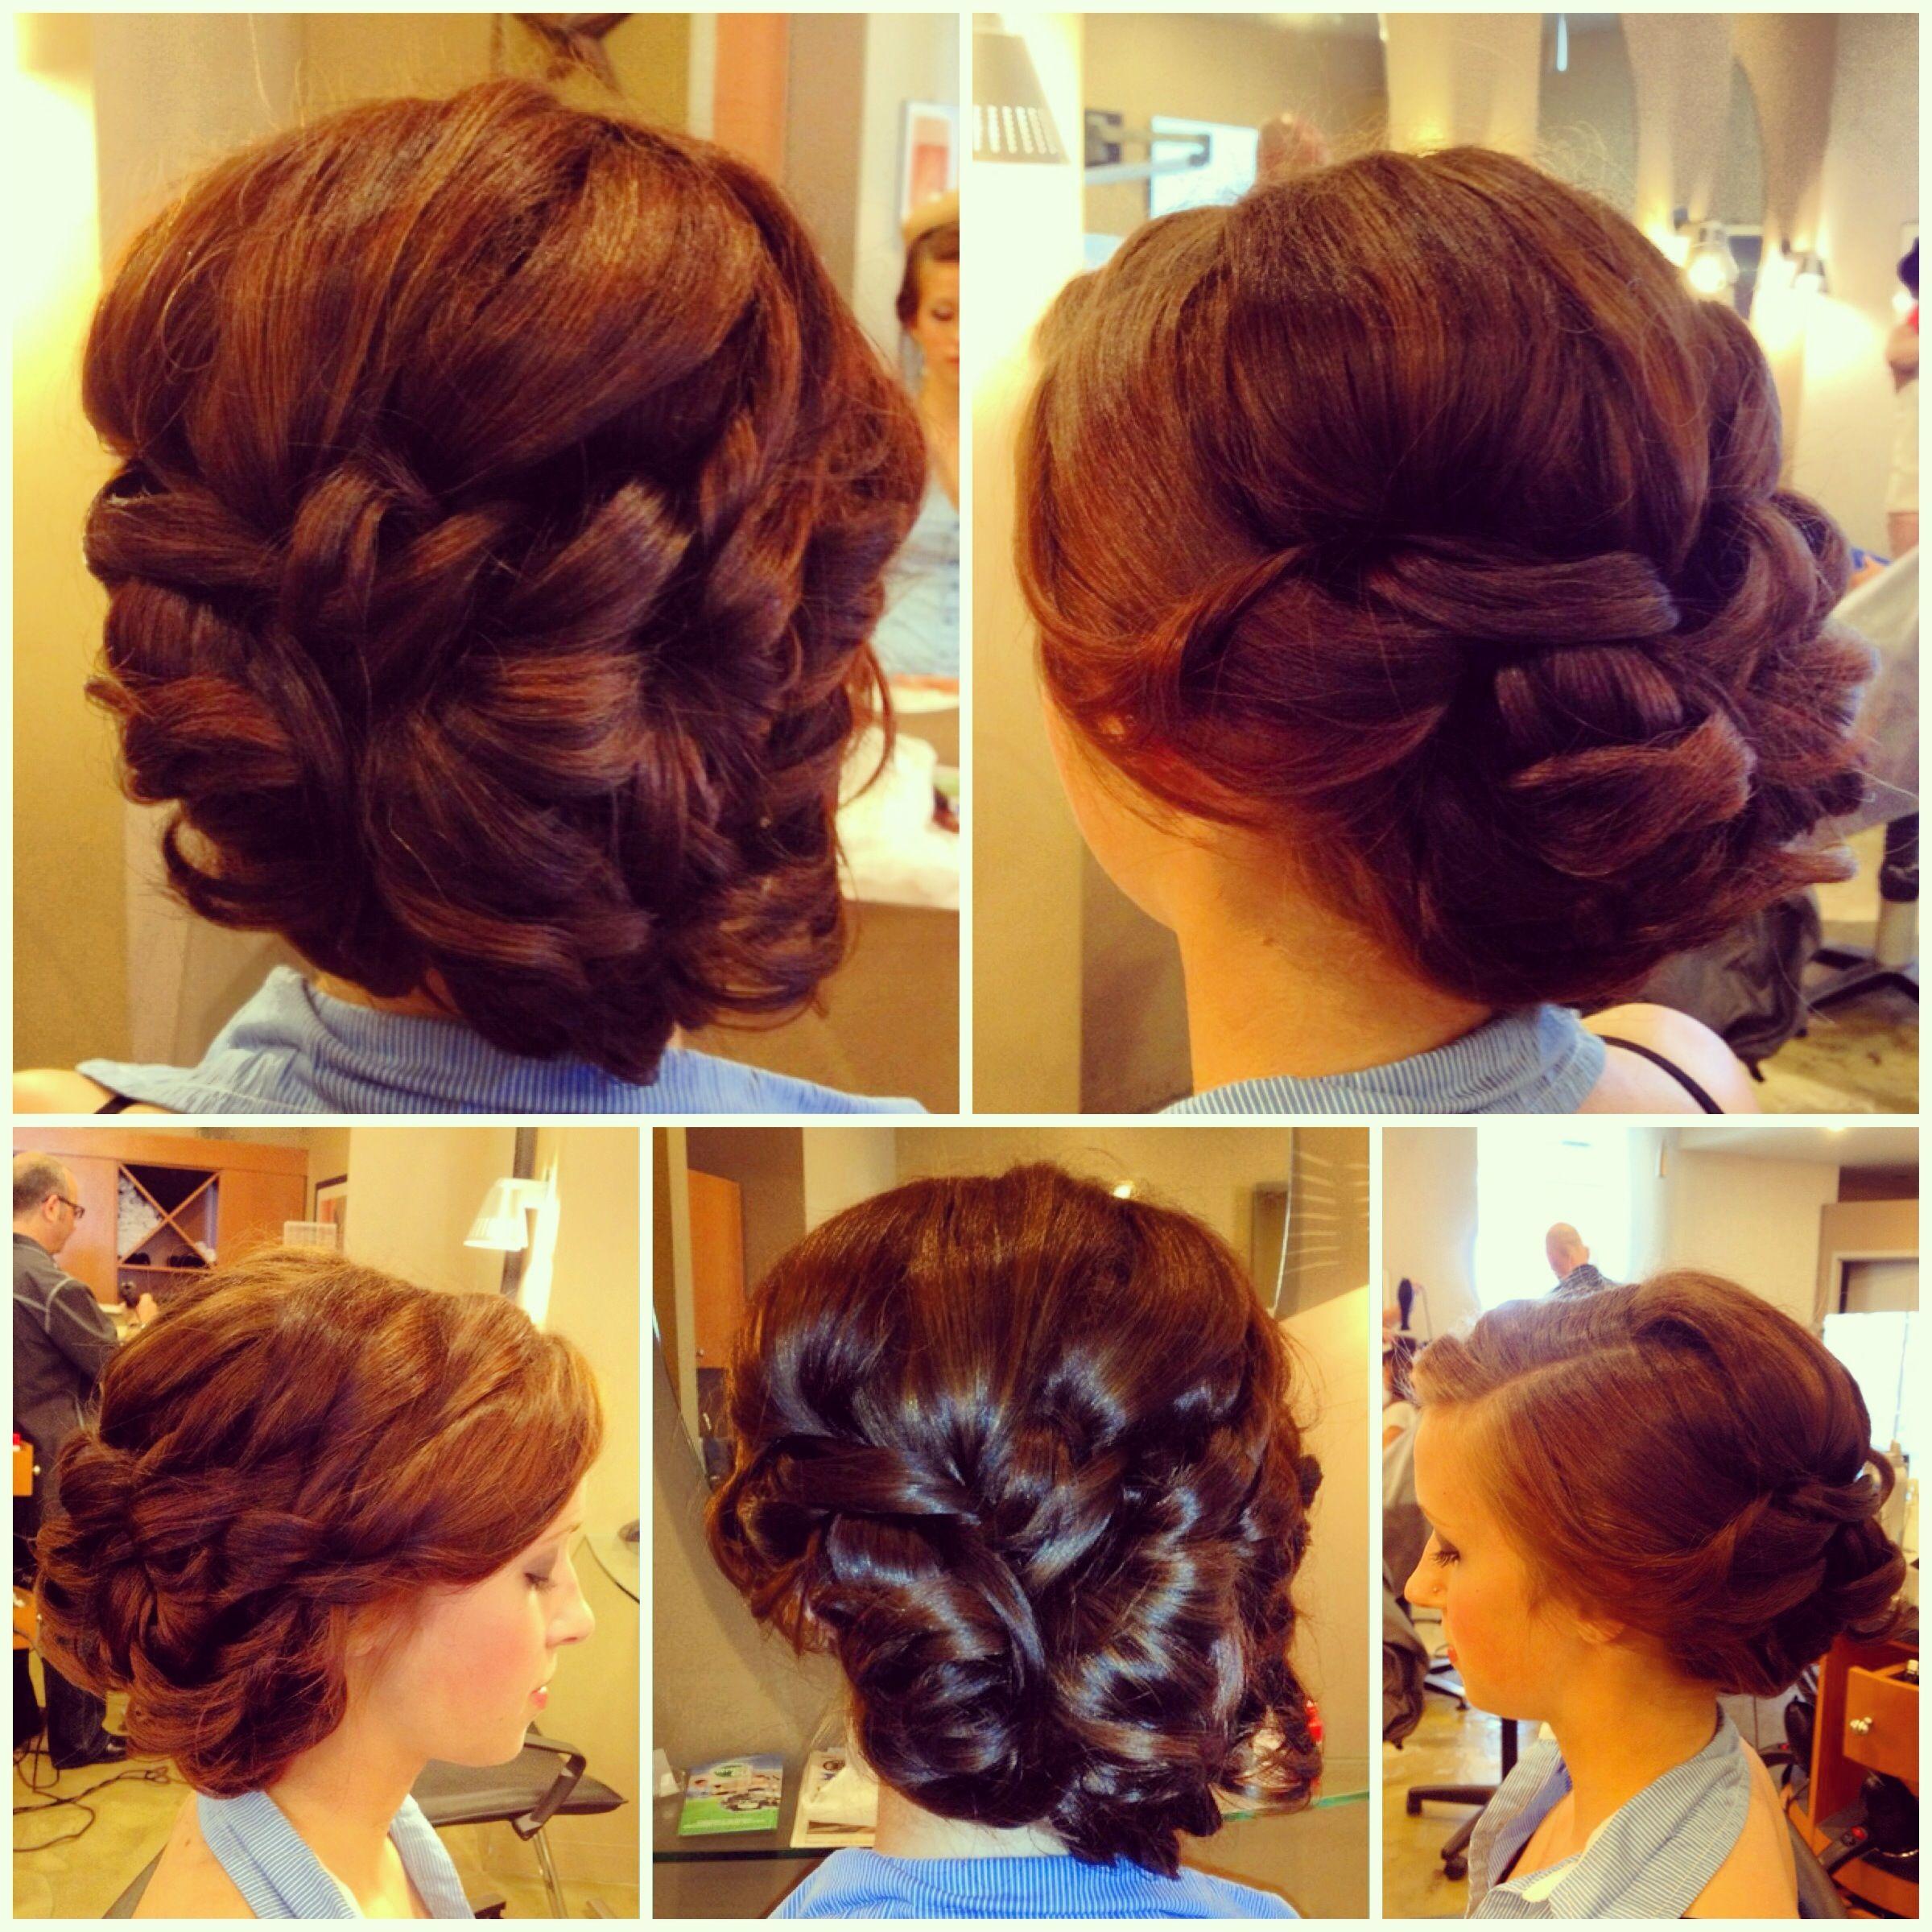 Formal updo prom hair bridal prom pinterest formal updo